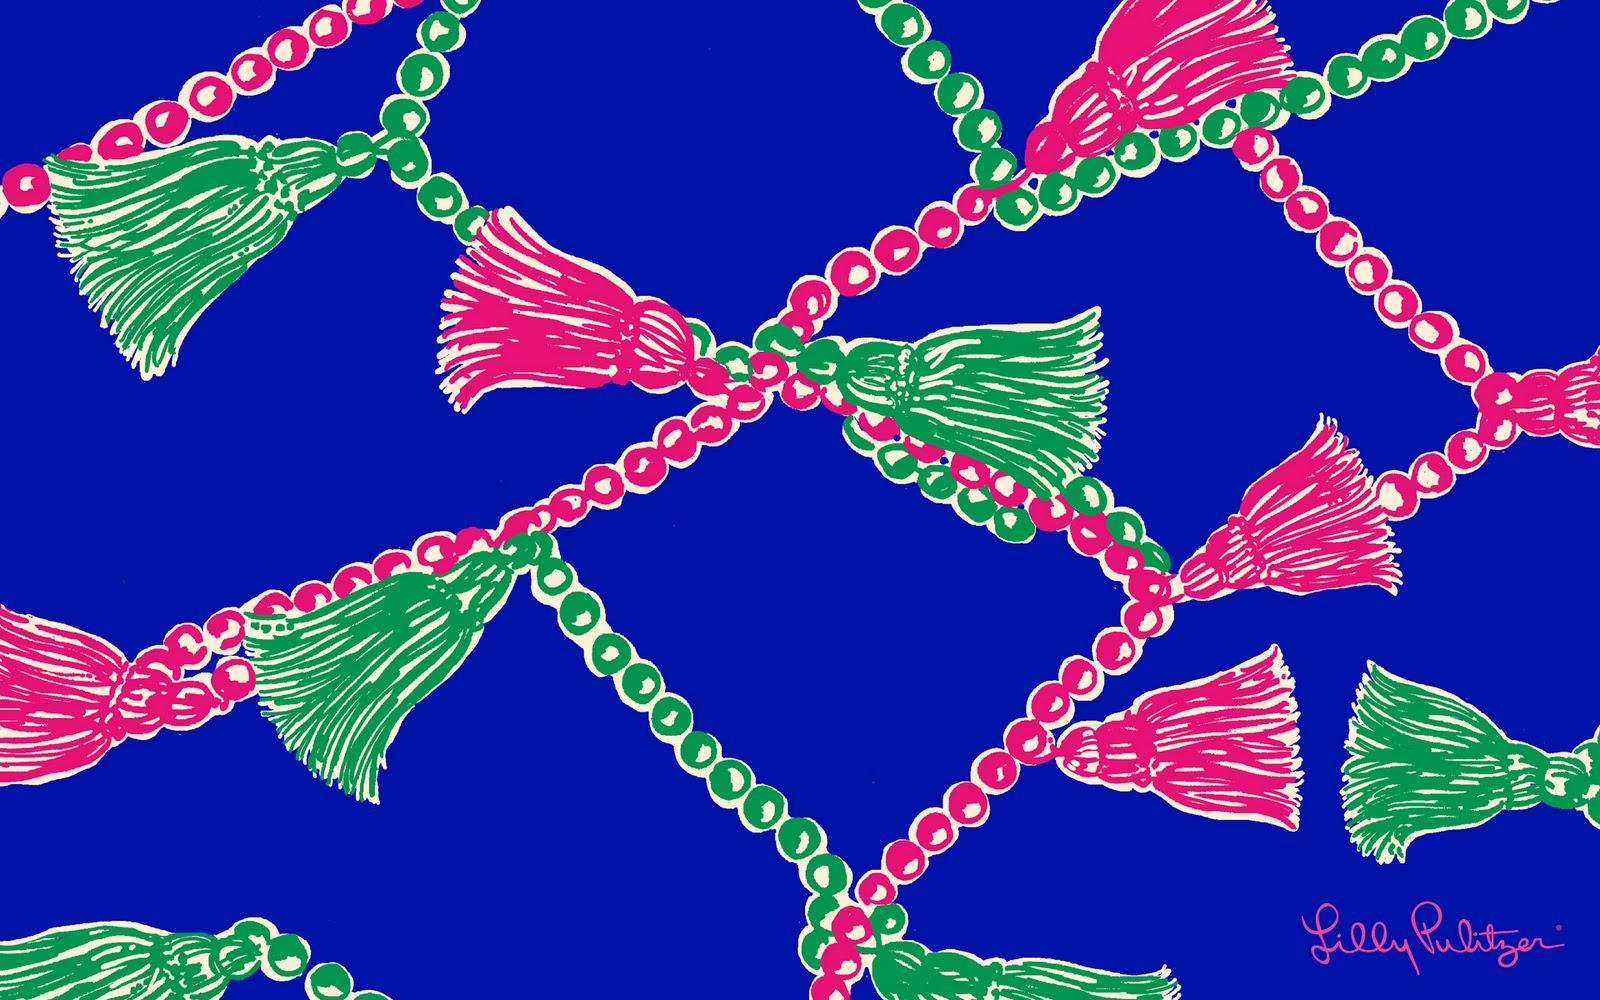 CanadianPrep-Lilly-Desktop-wallpaper-wp5002503